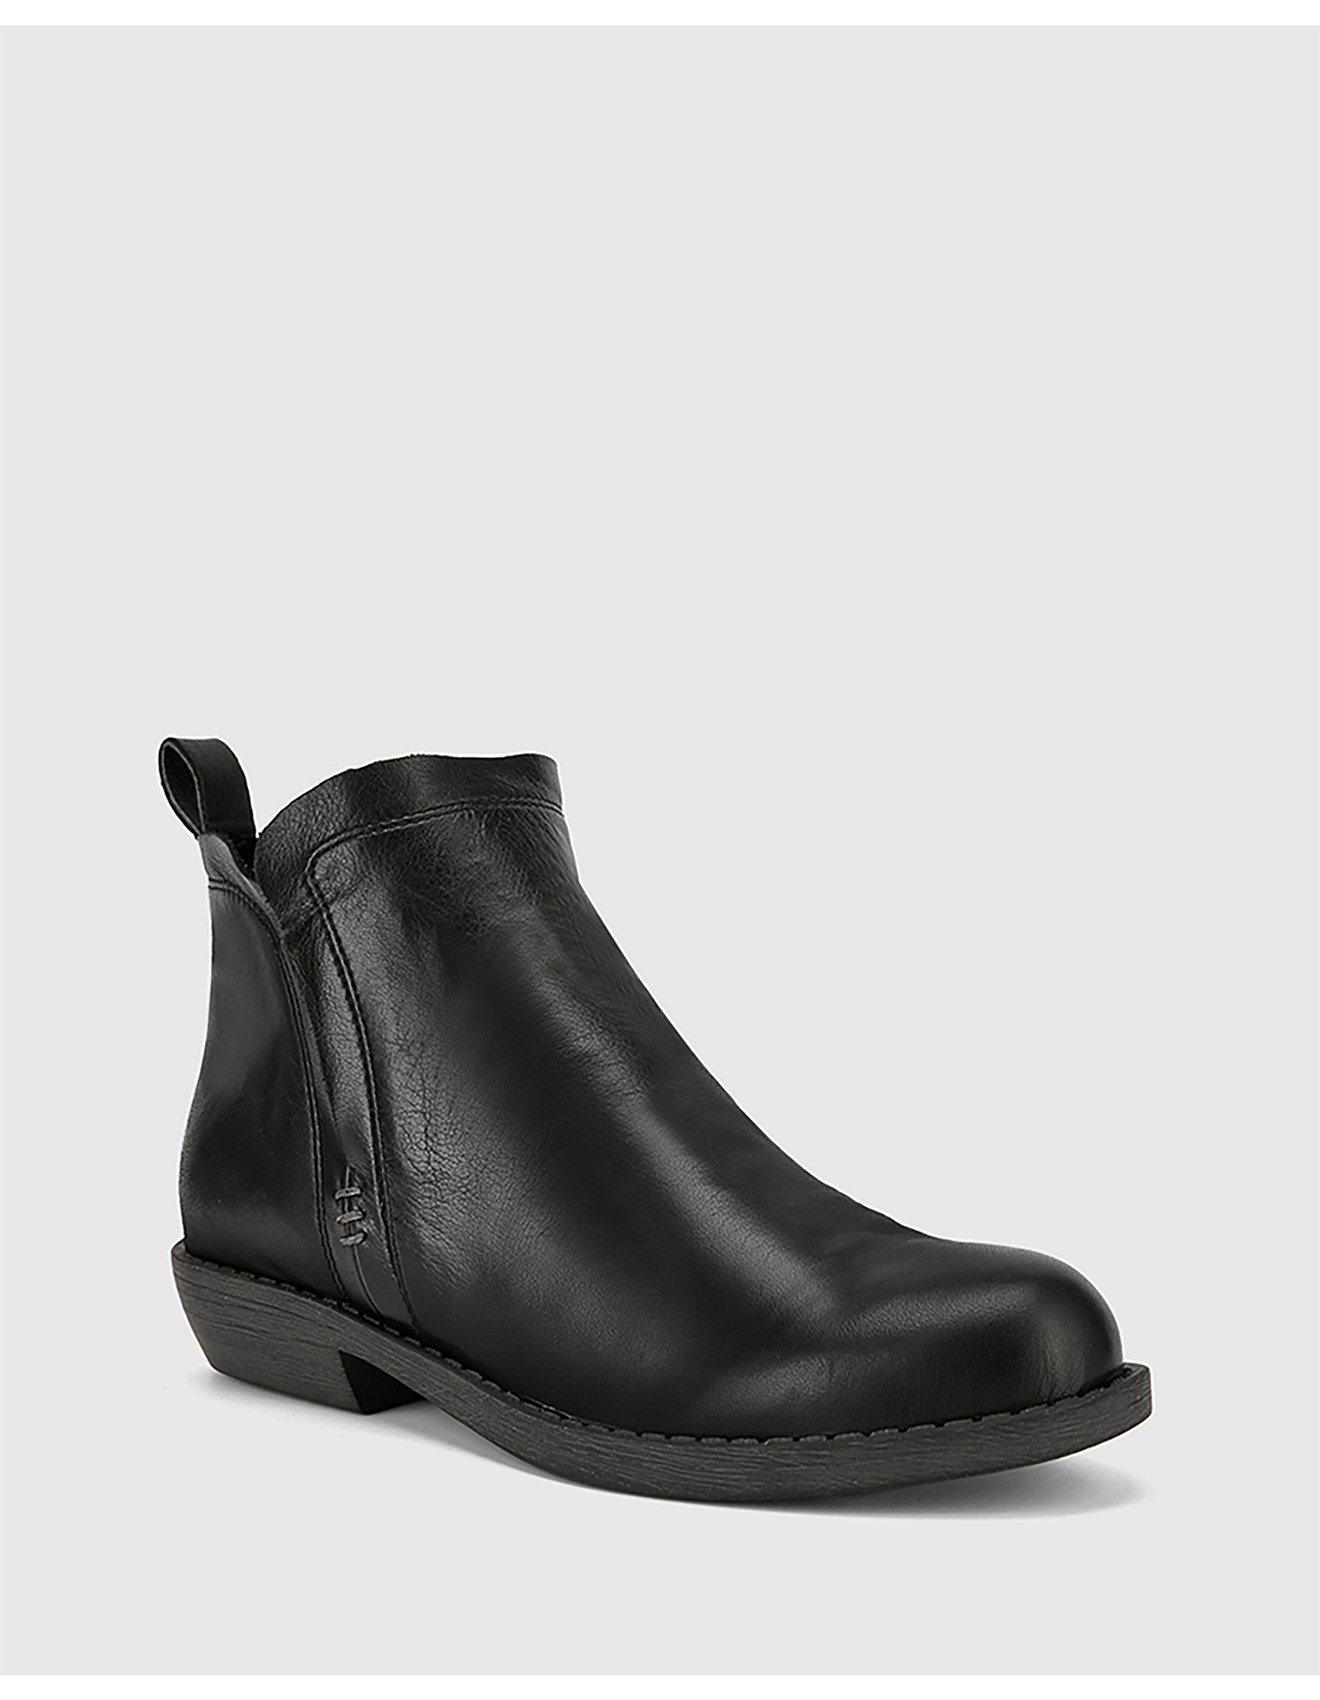 Wittner - Dan Black Scotch Leather